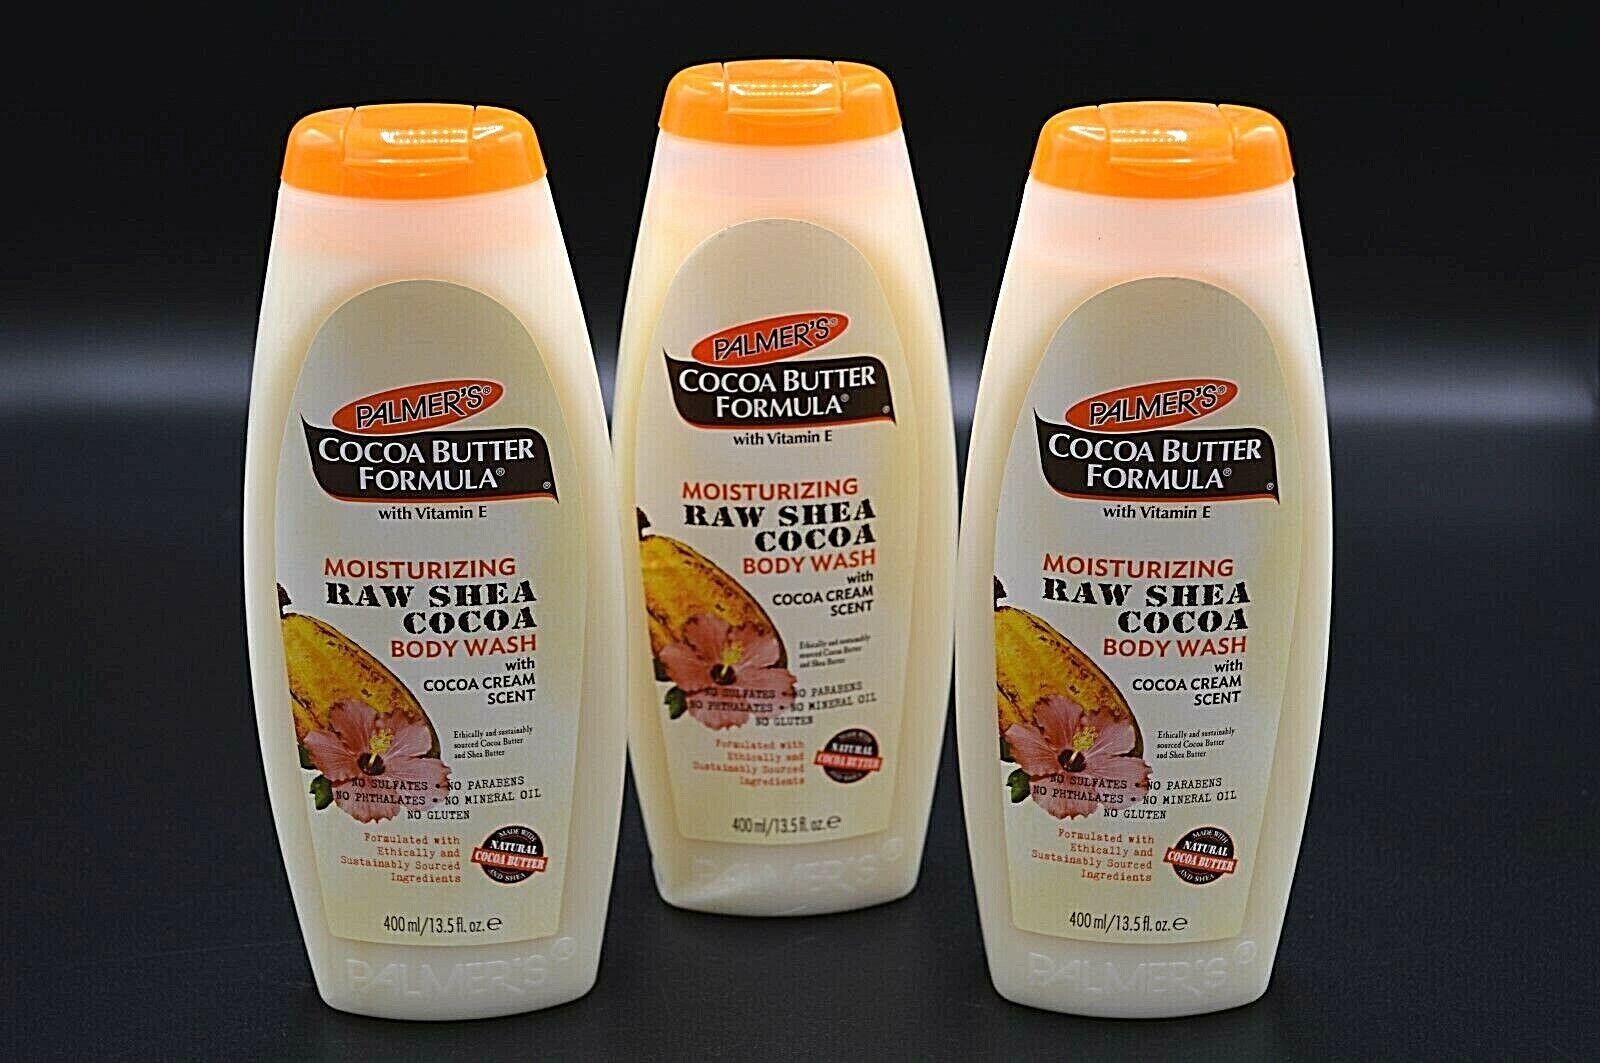 Cocoa Butter Formula, Moisturizing Raw Shea Cocoa Body Wash